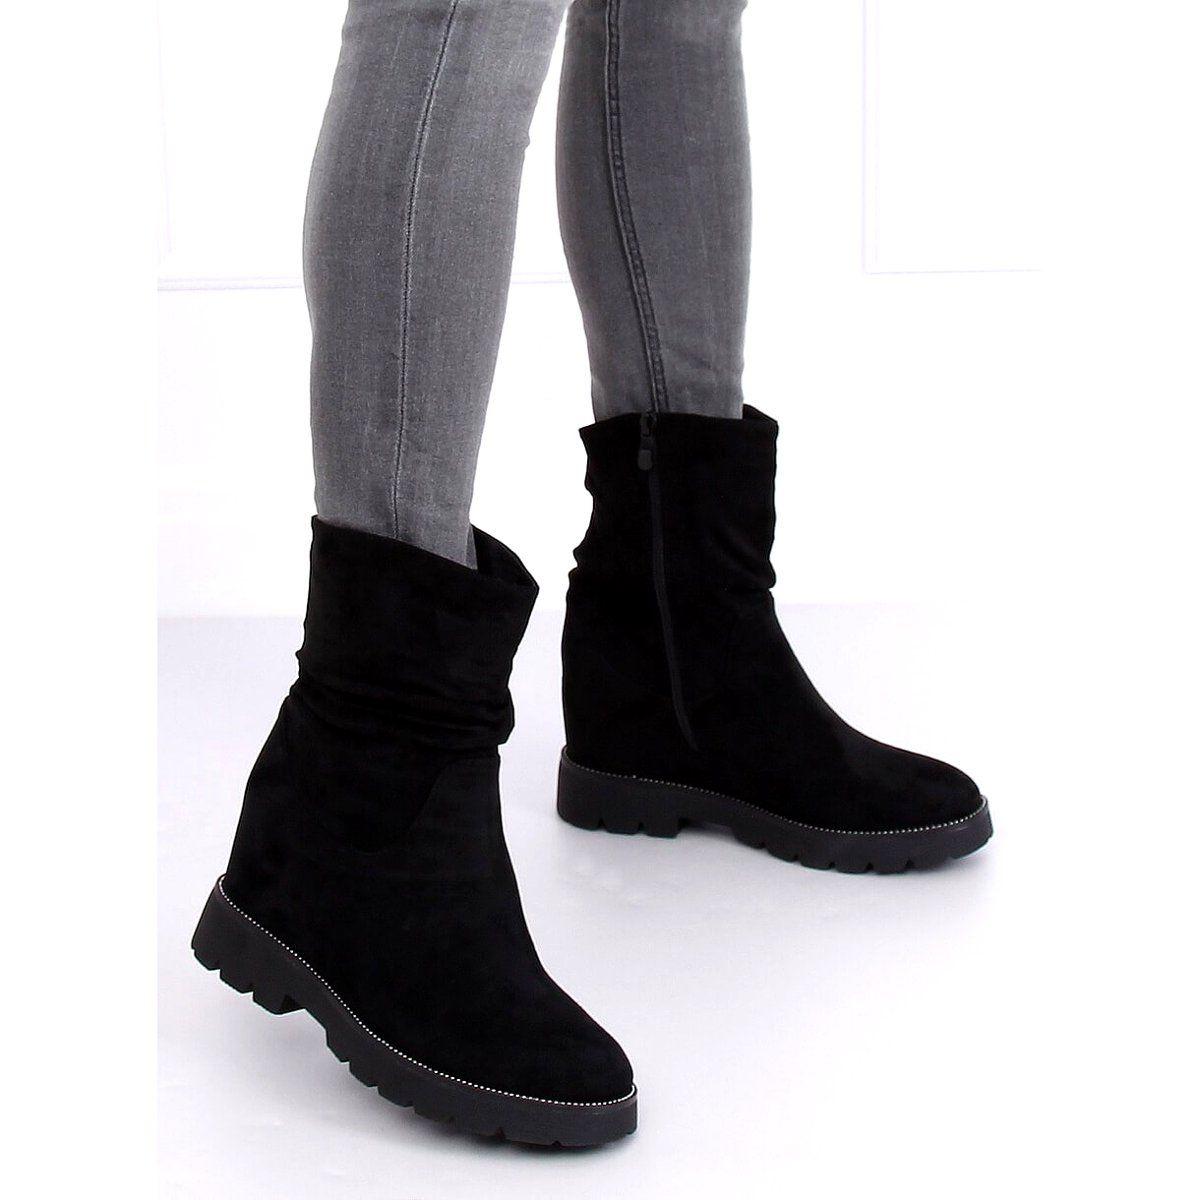 Botki Damskie Butymodne Botki Na Ukrytym Koturnie Czarne 7978 Ka Black Boots Ugg Boots Shoes